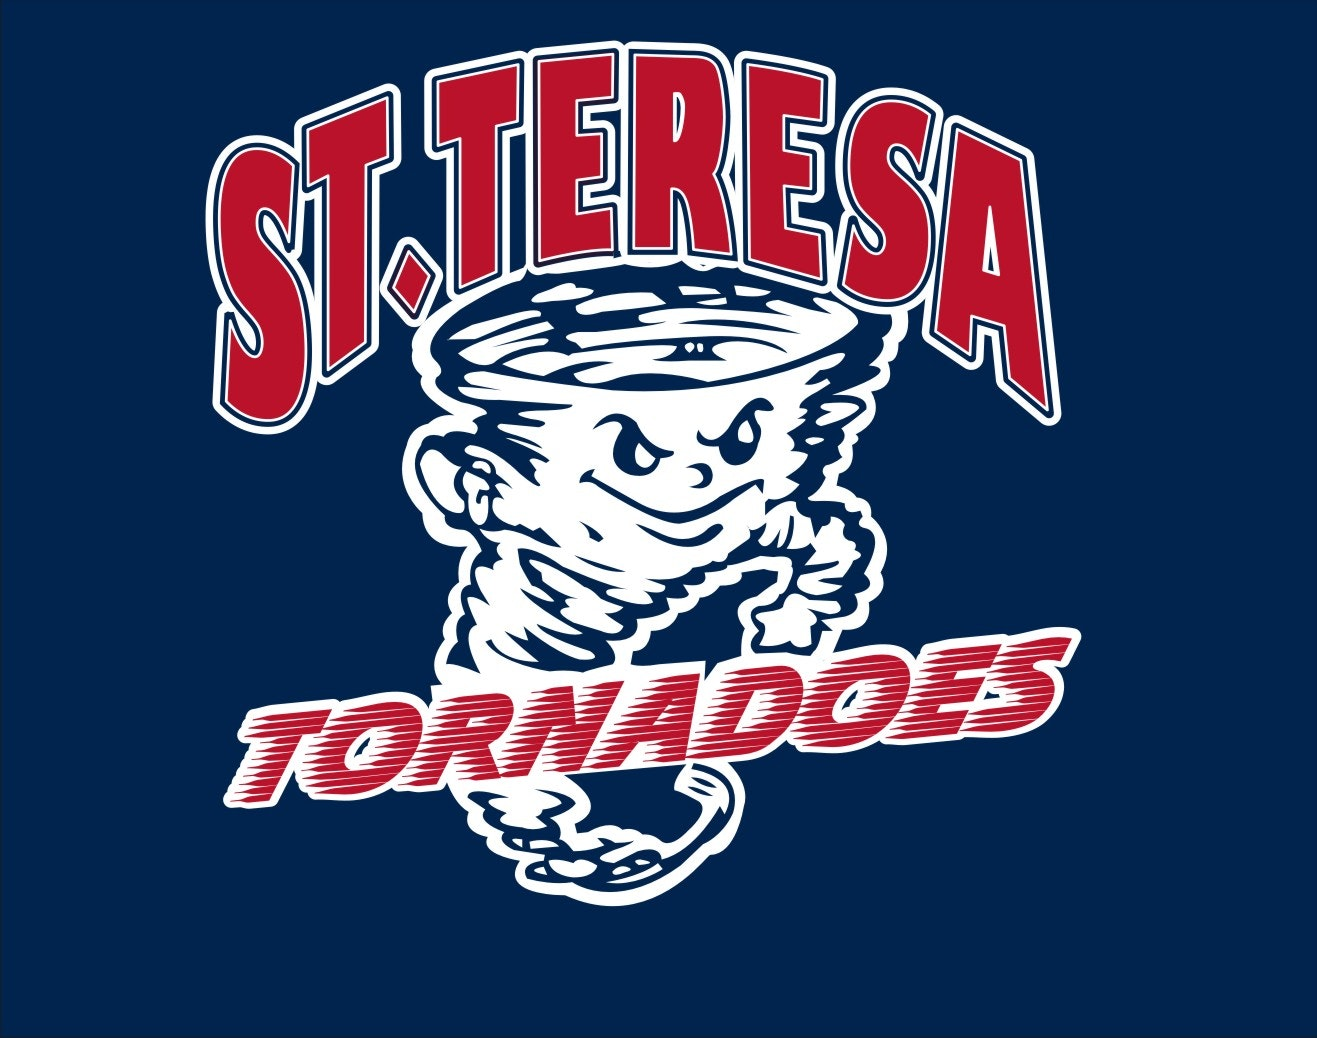 St. Teresa Tornadoes love to read!